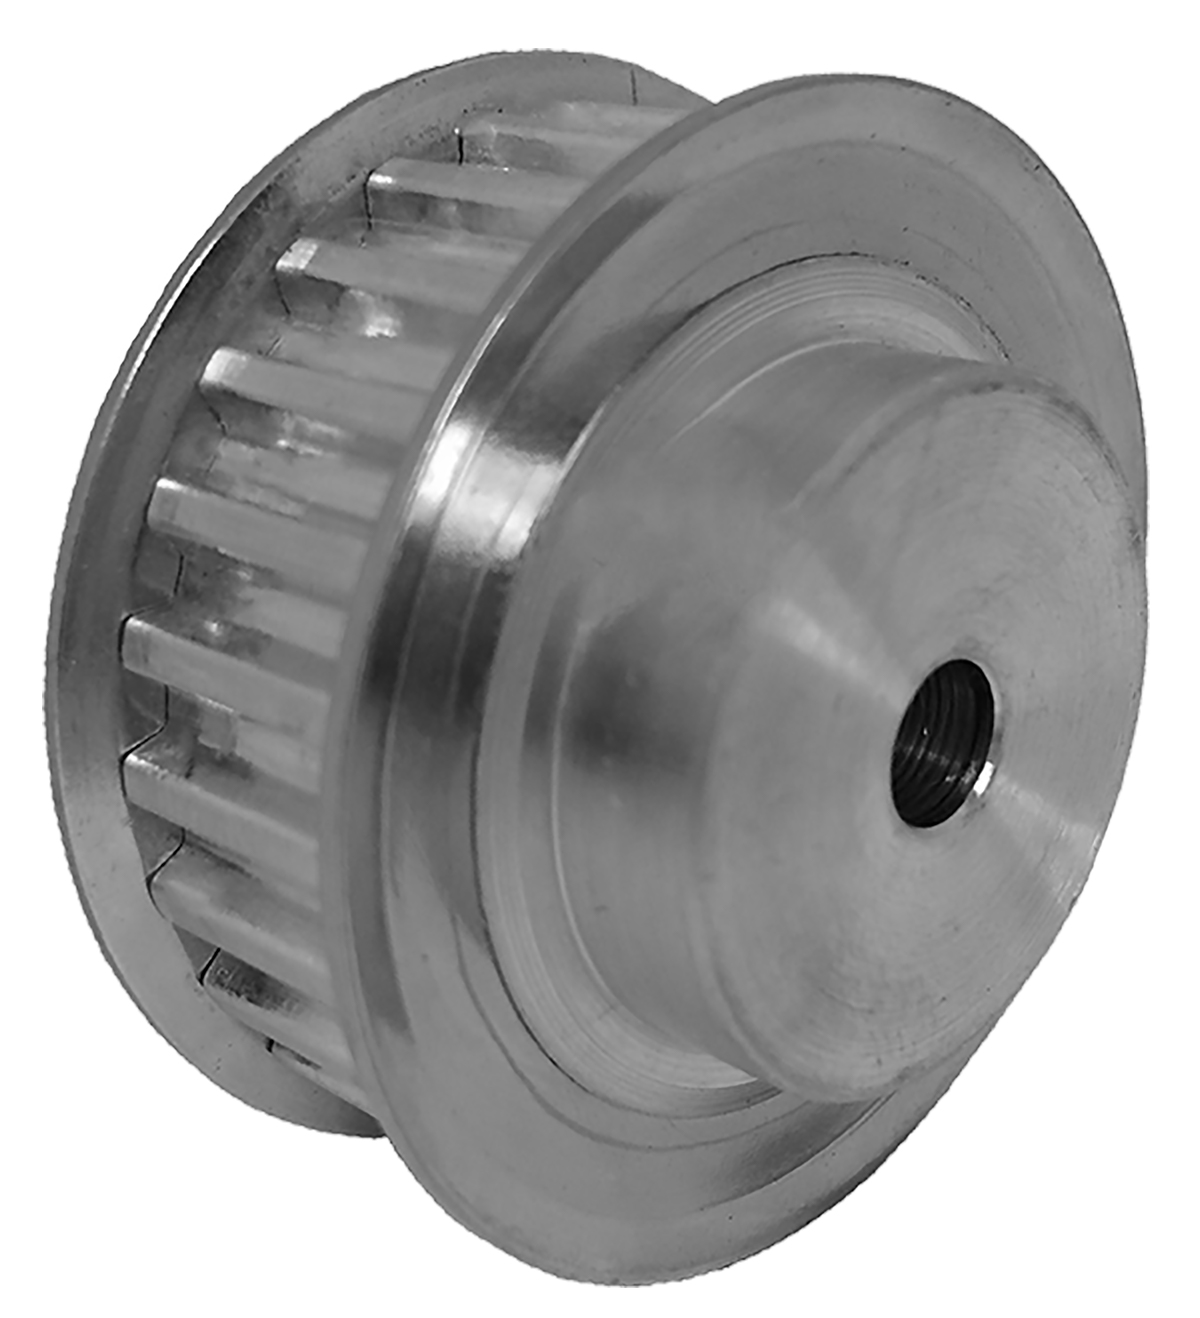 21T5/26-2 - Aluminum Metric Pulleys